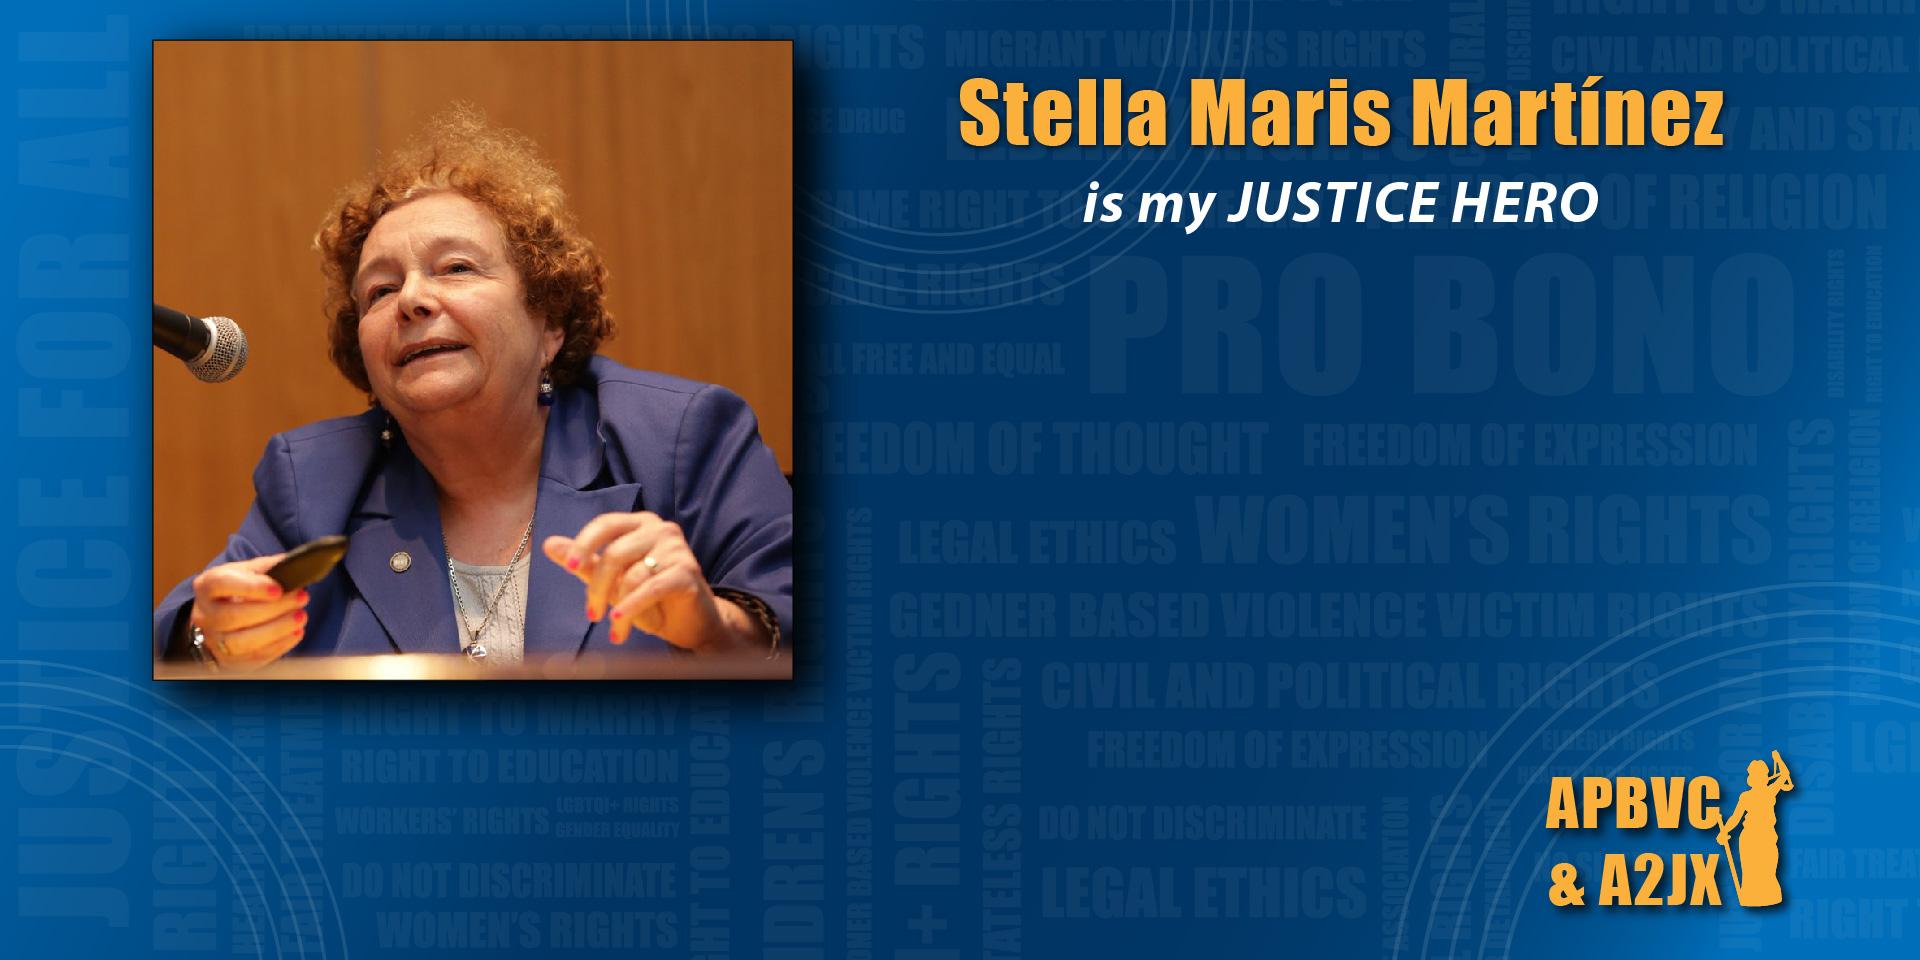 Stella Maris Martínez